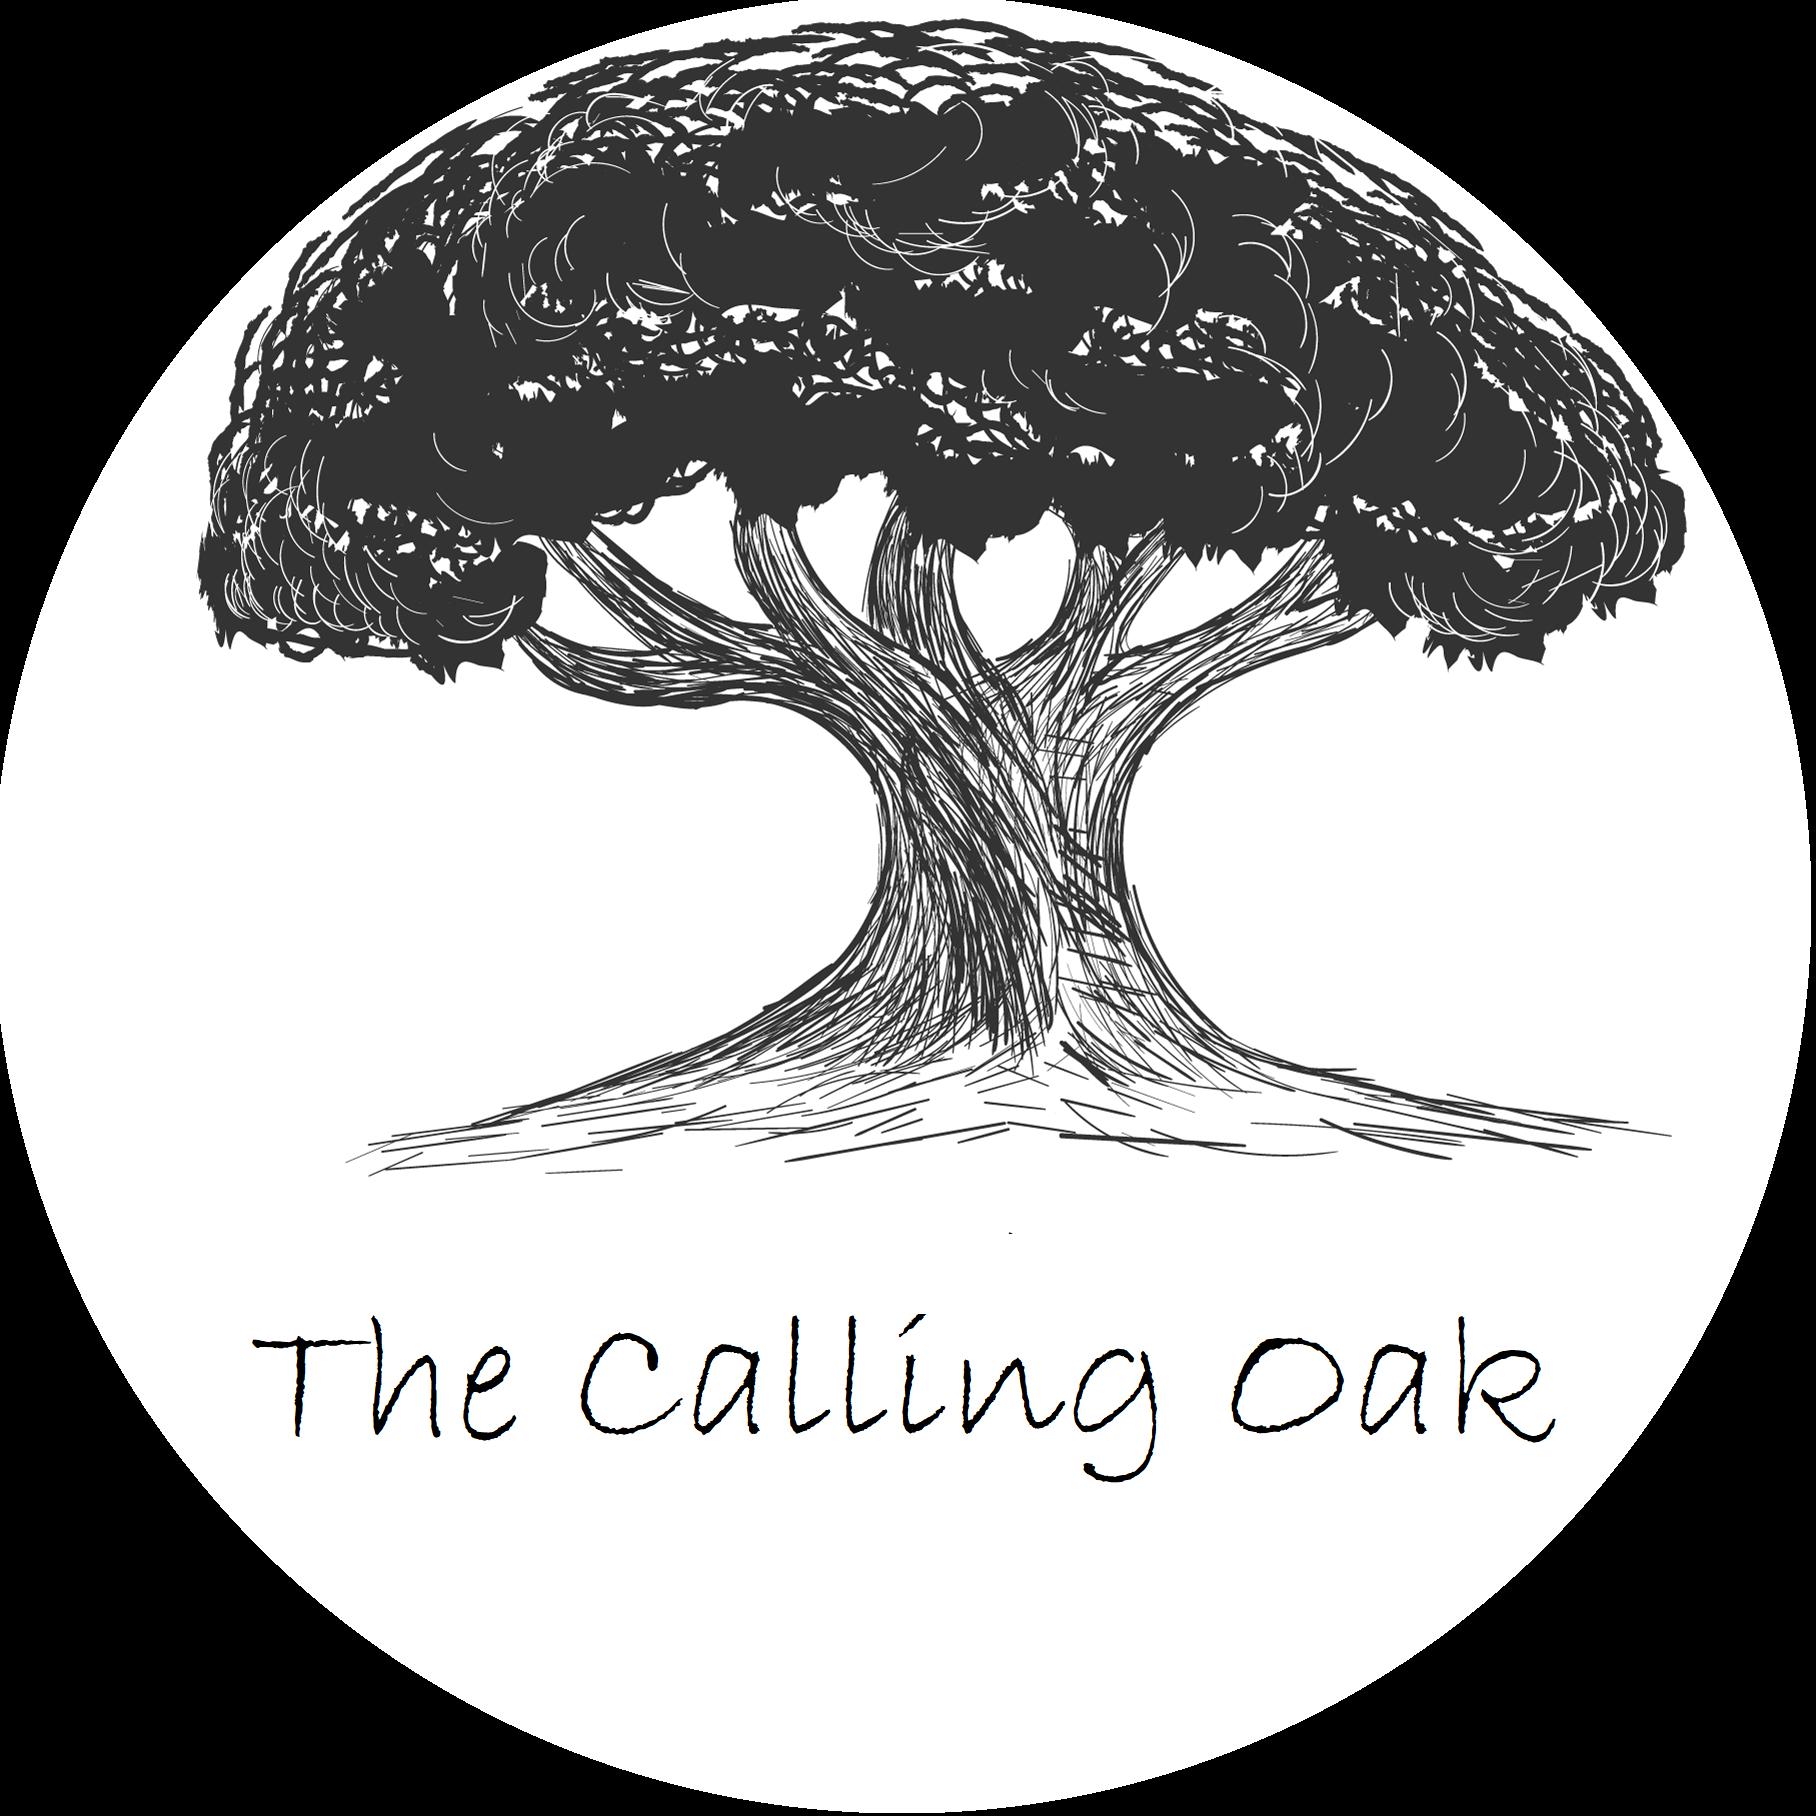 The Calling Oak